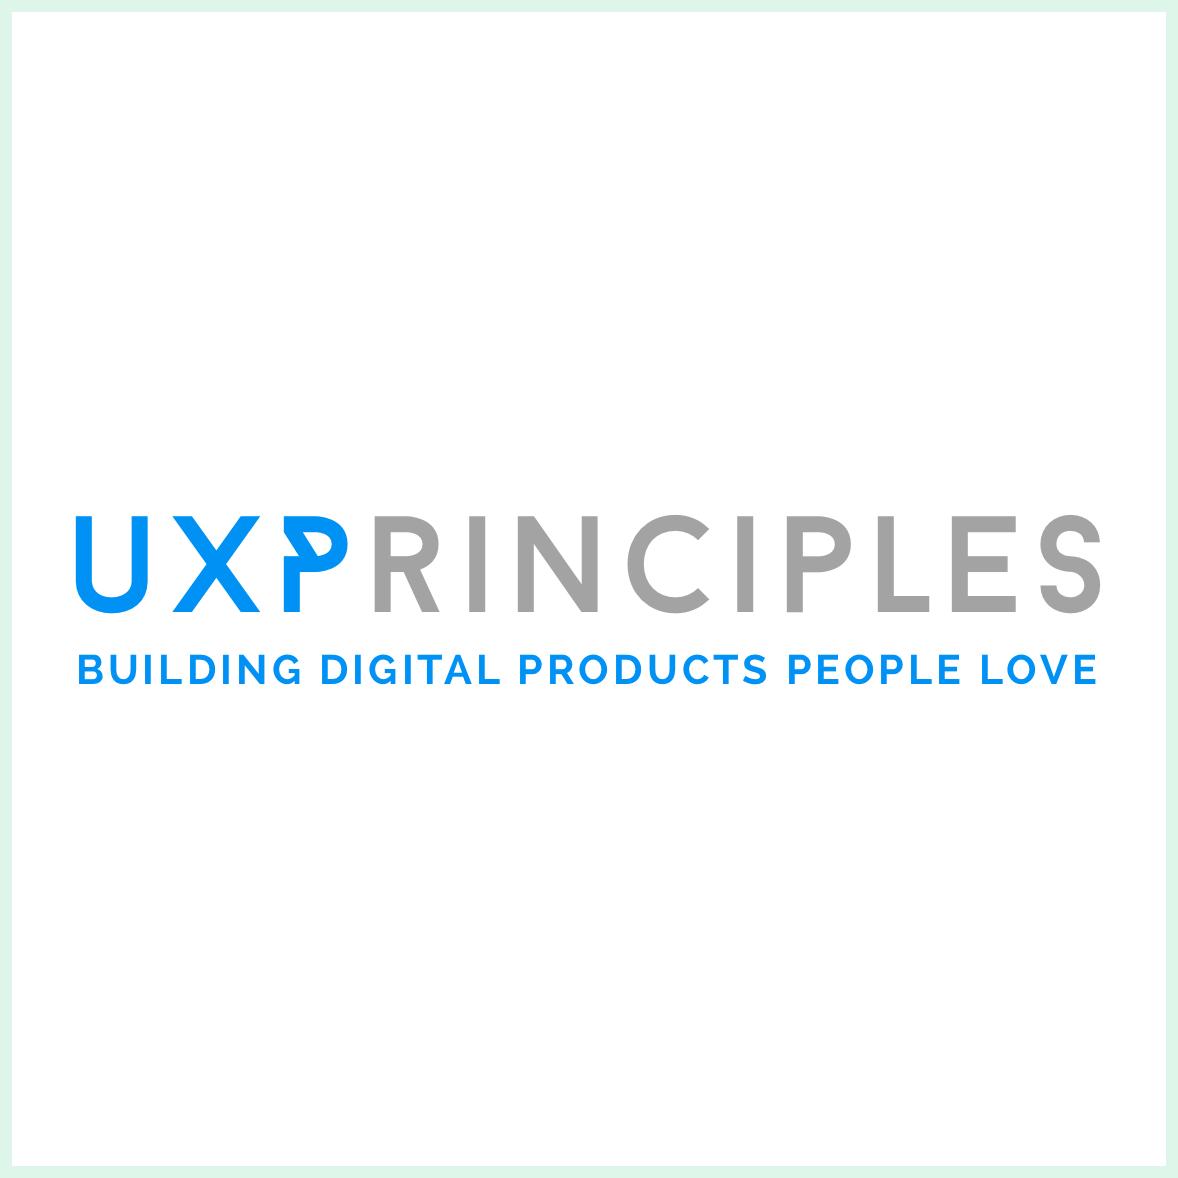 UX PRINCIPLES